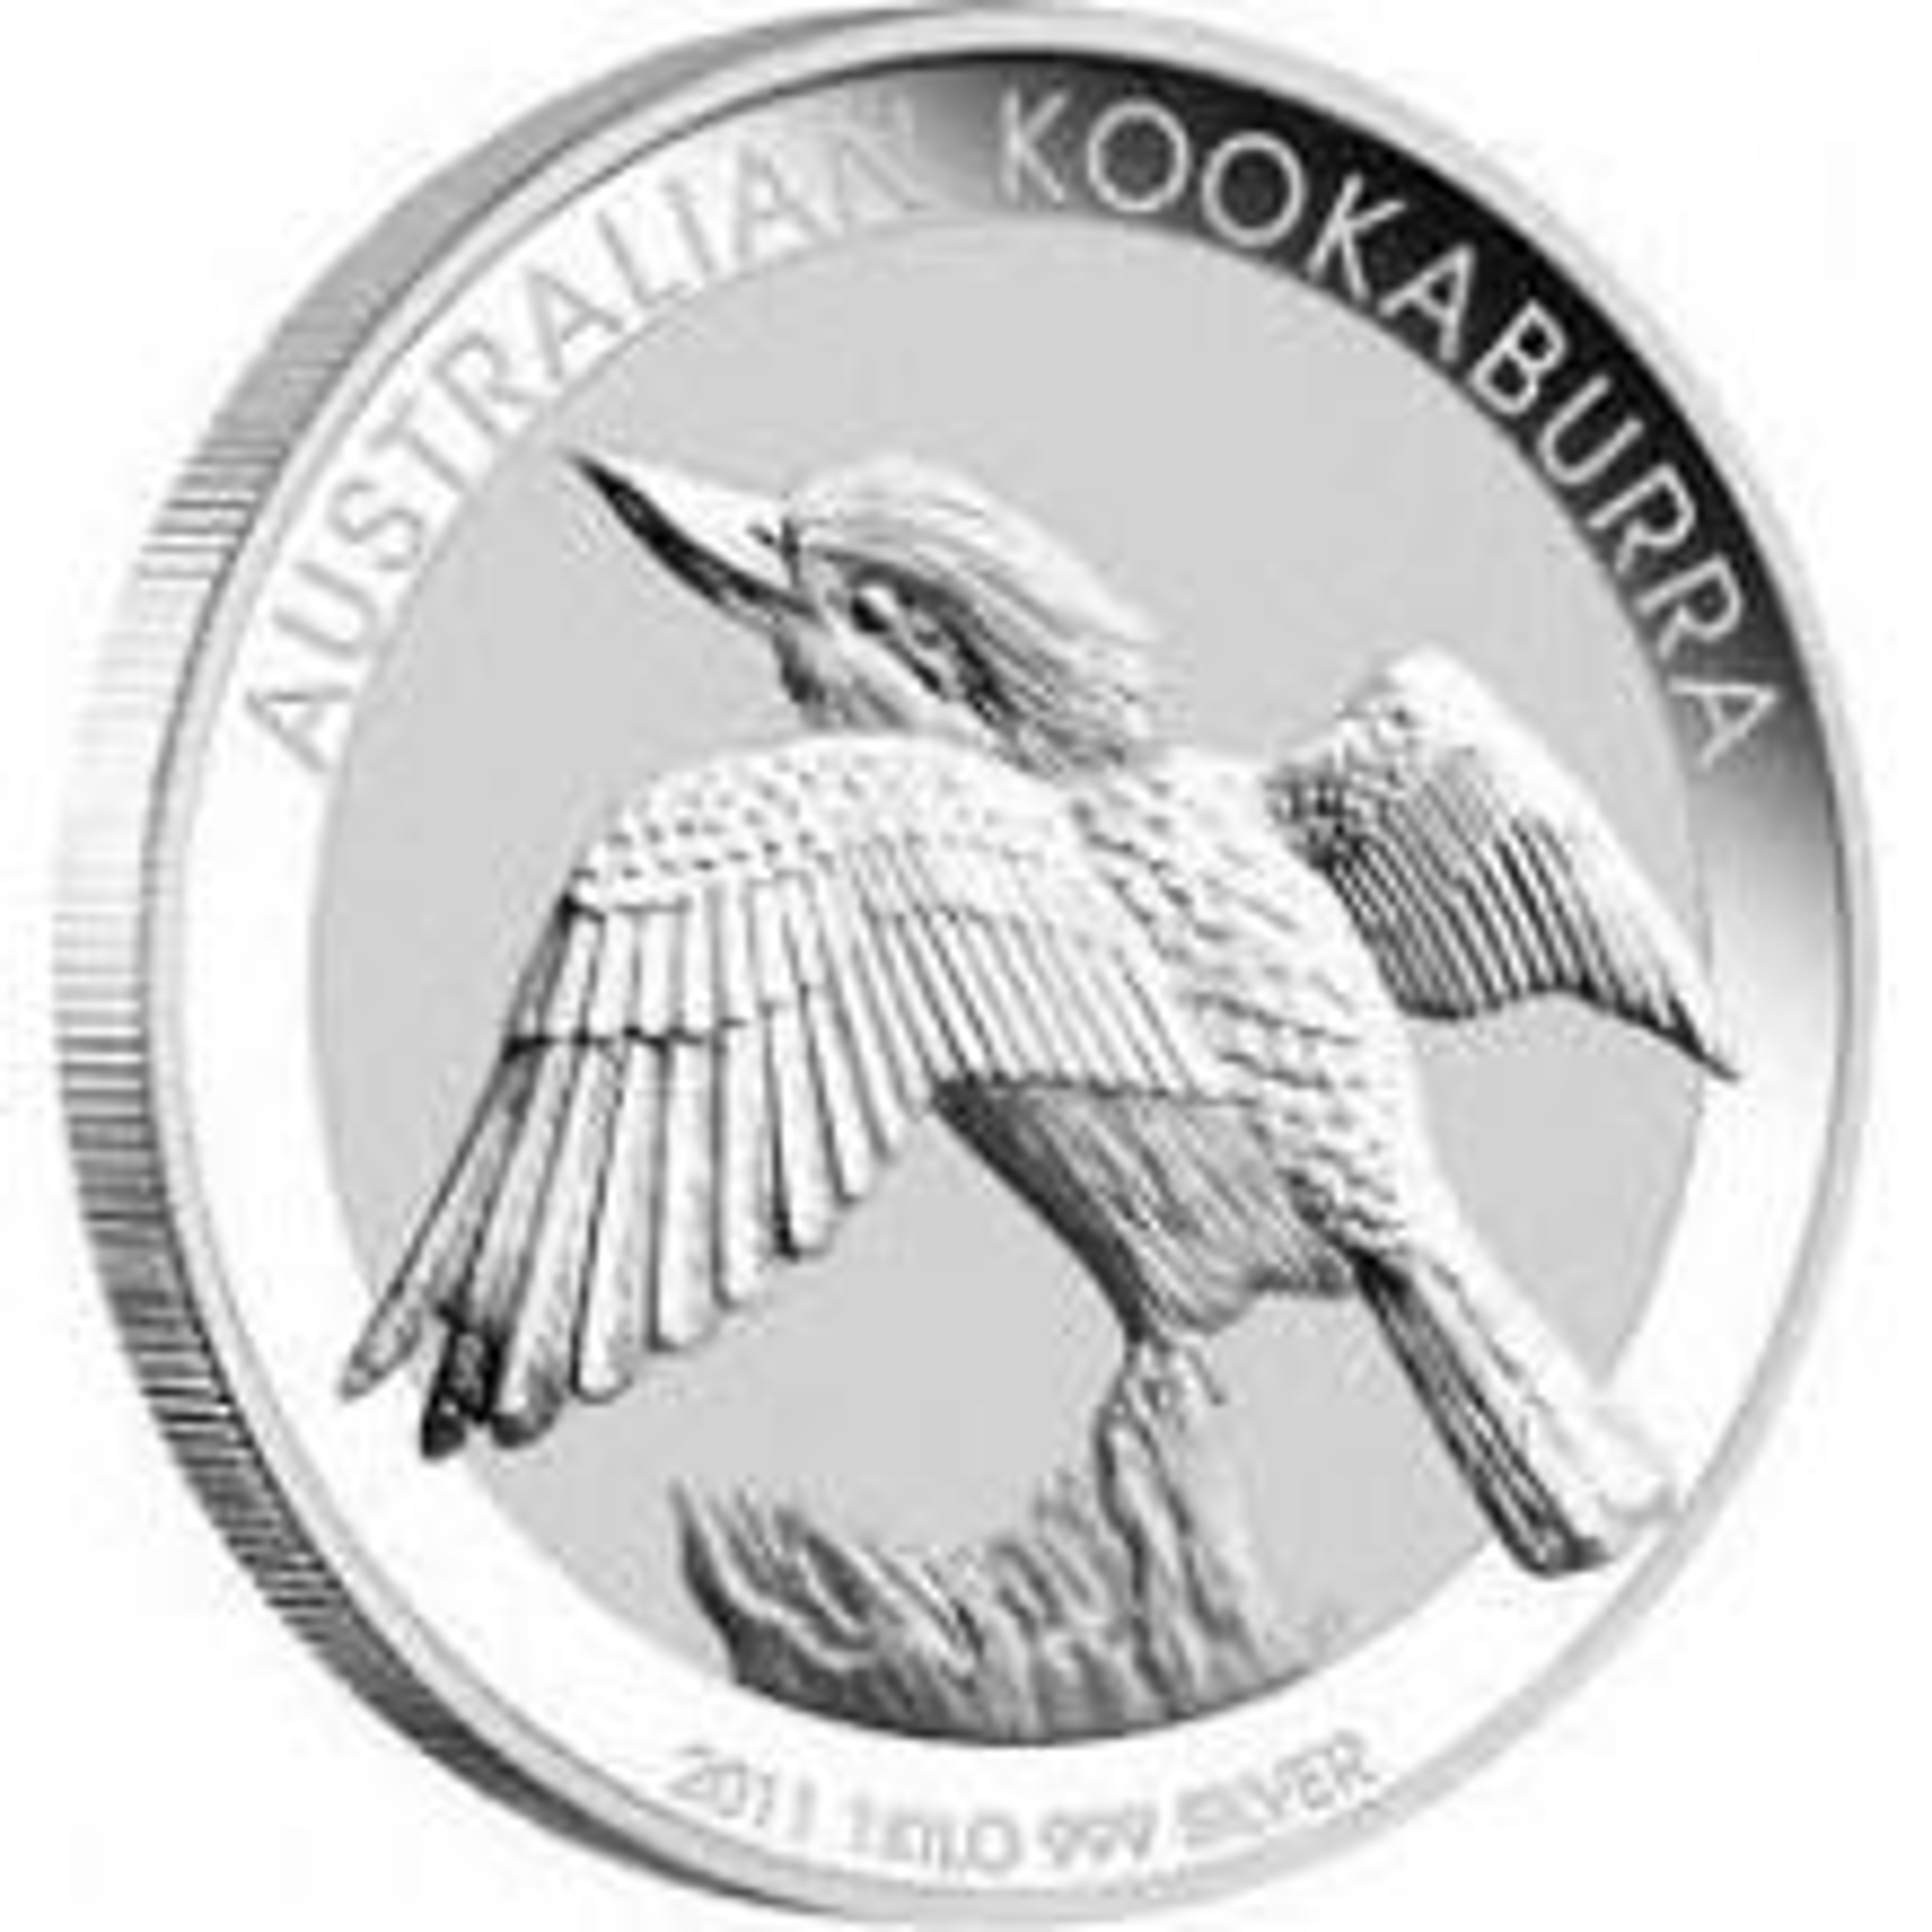 1 Kilo Kookaburra silver coin 2011